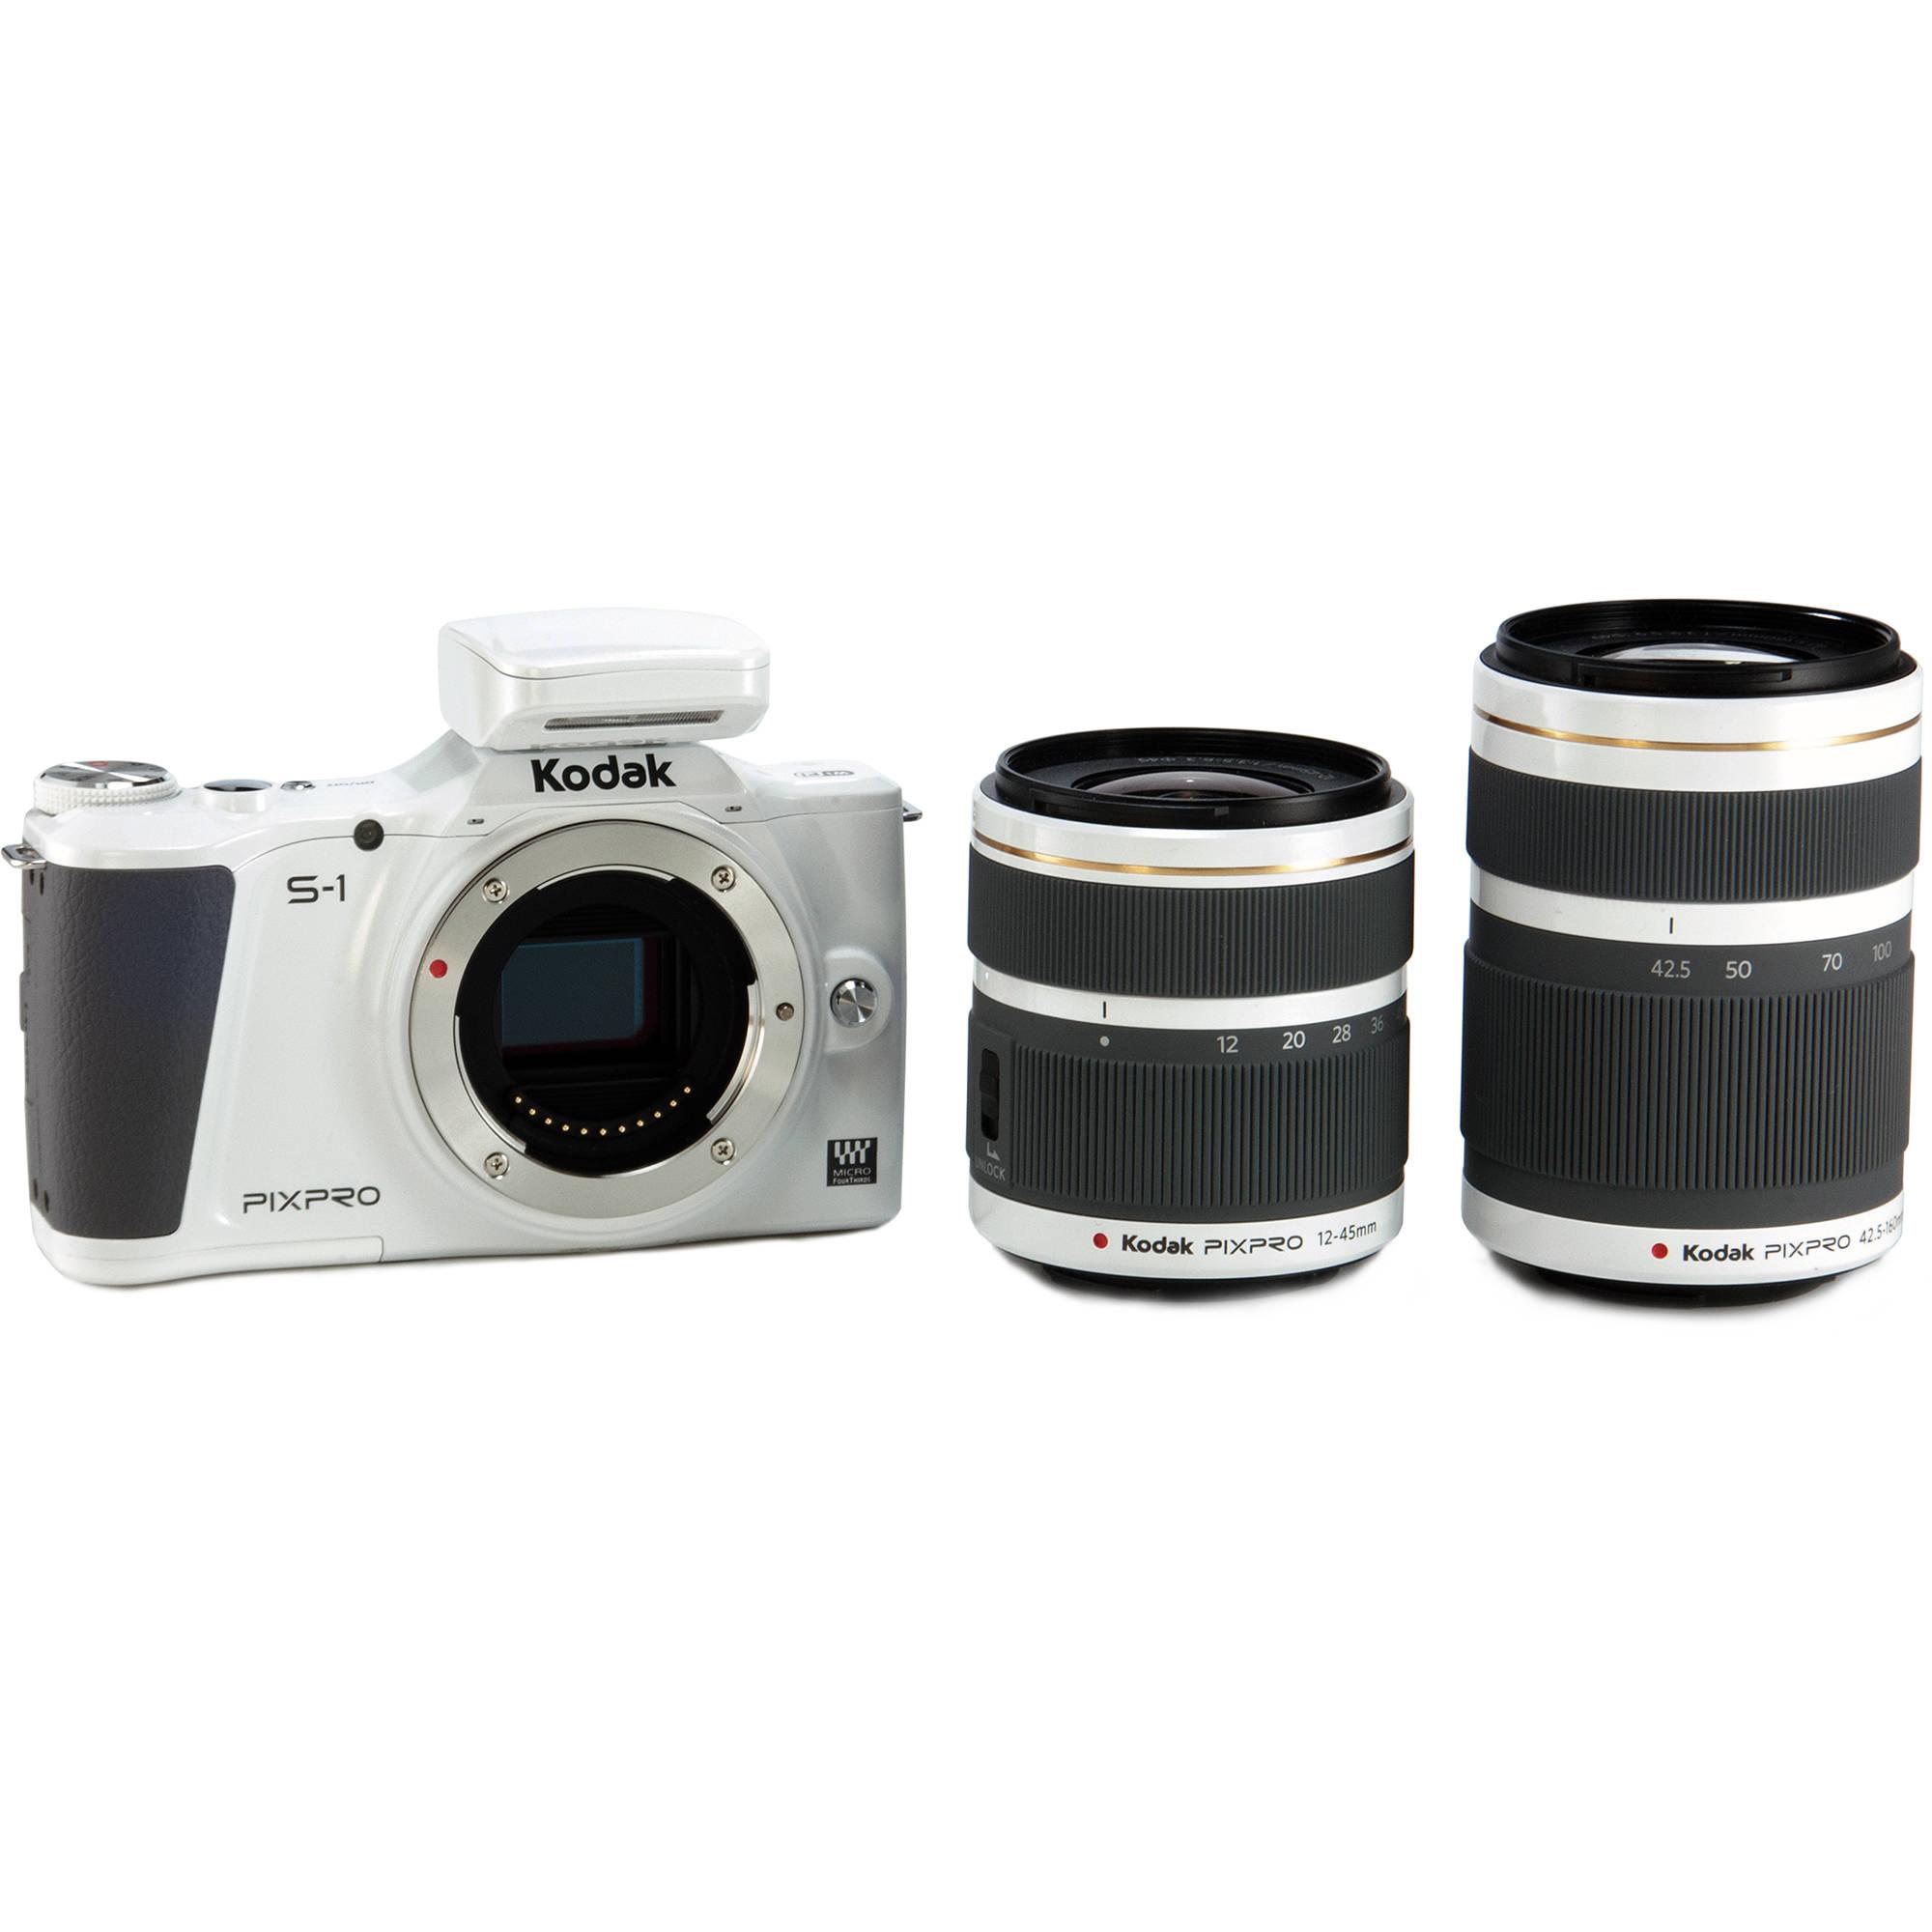 Kodak PIXPRO S-1 Mirrorless Digital Camera with 12-45mm S1WH6